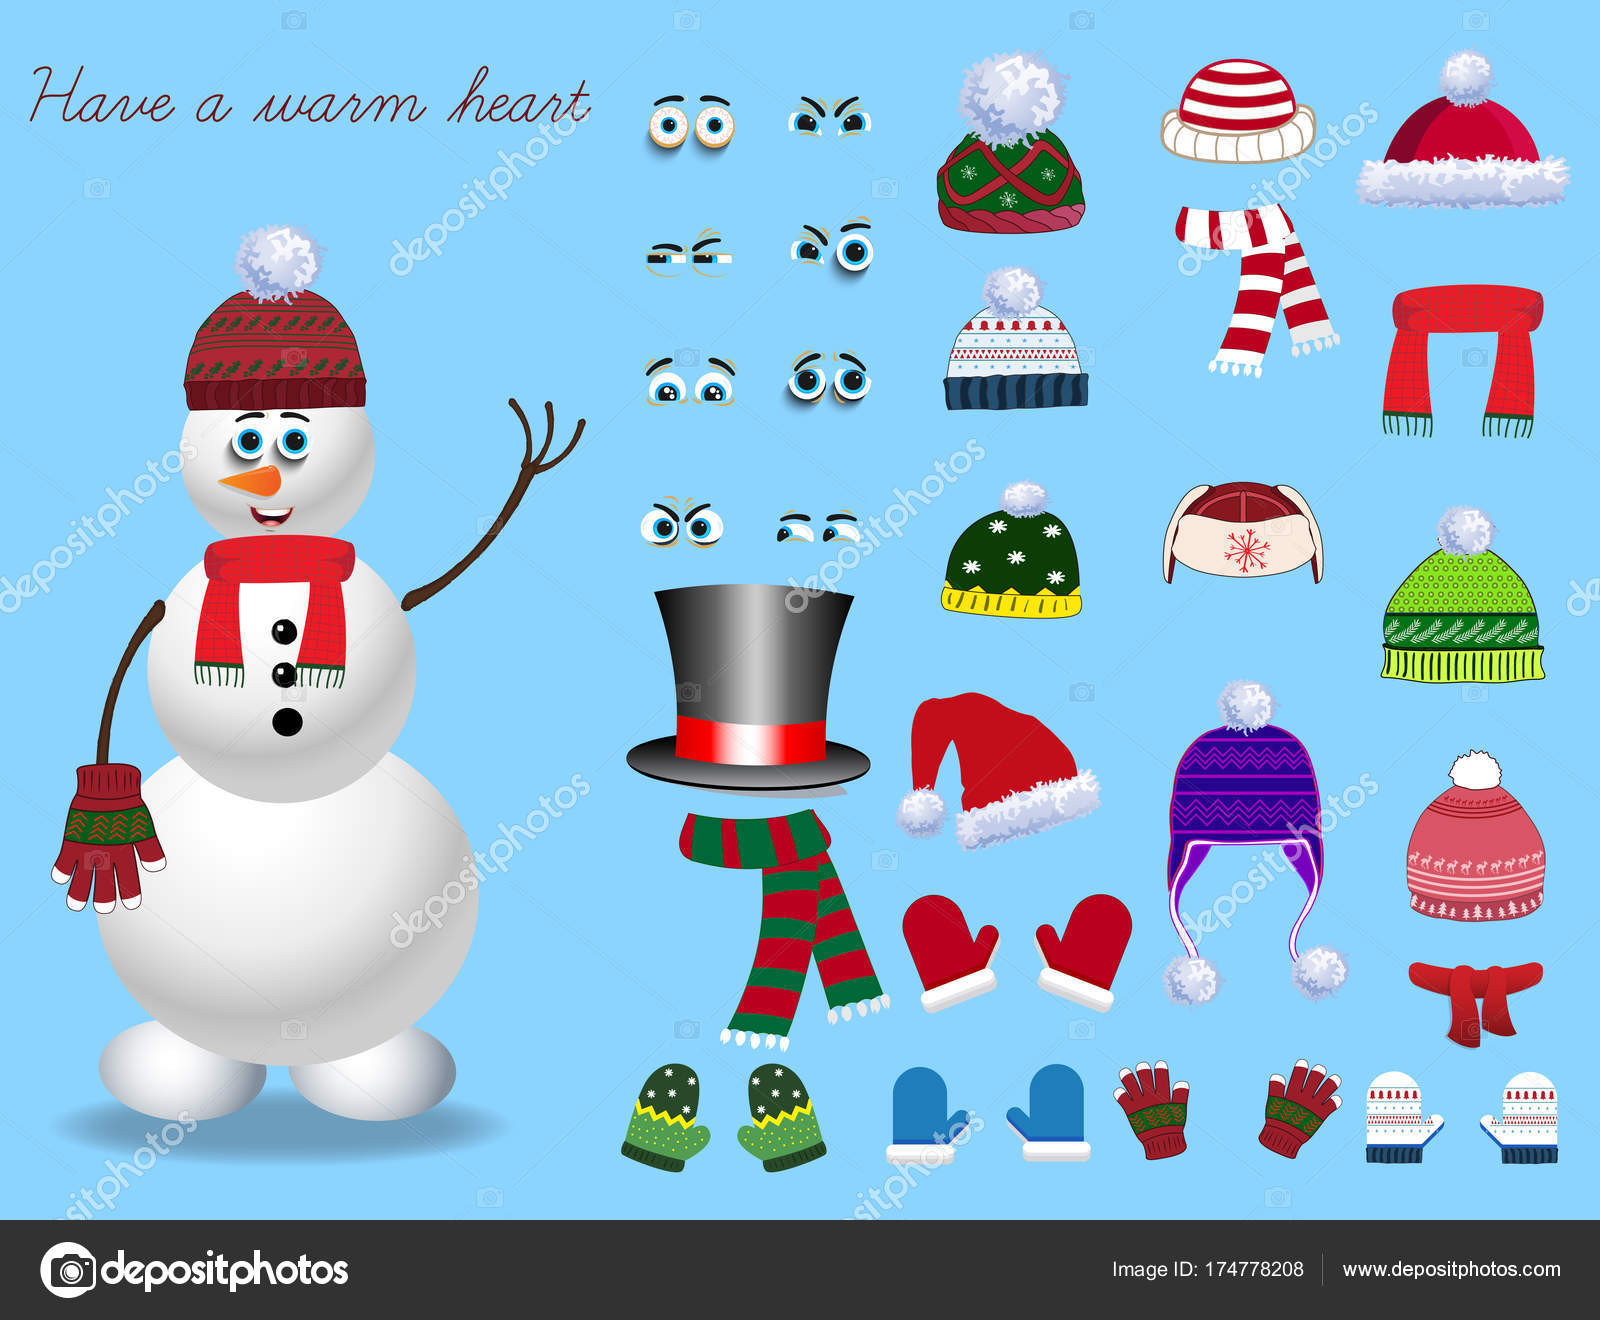 2ffd104285d2 Για τη δημιουργία κινουμένων σχεδίων χαριτωμένο χιονάνθρωπος χαρακτήρα–  εικονογράφηση αρχείου